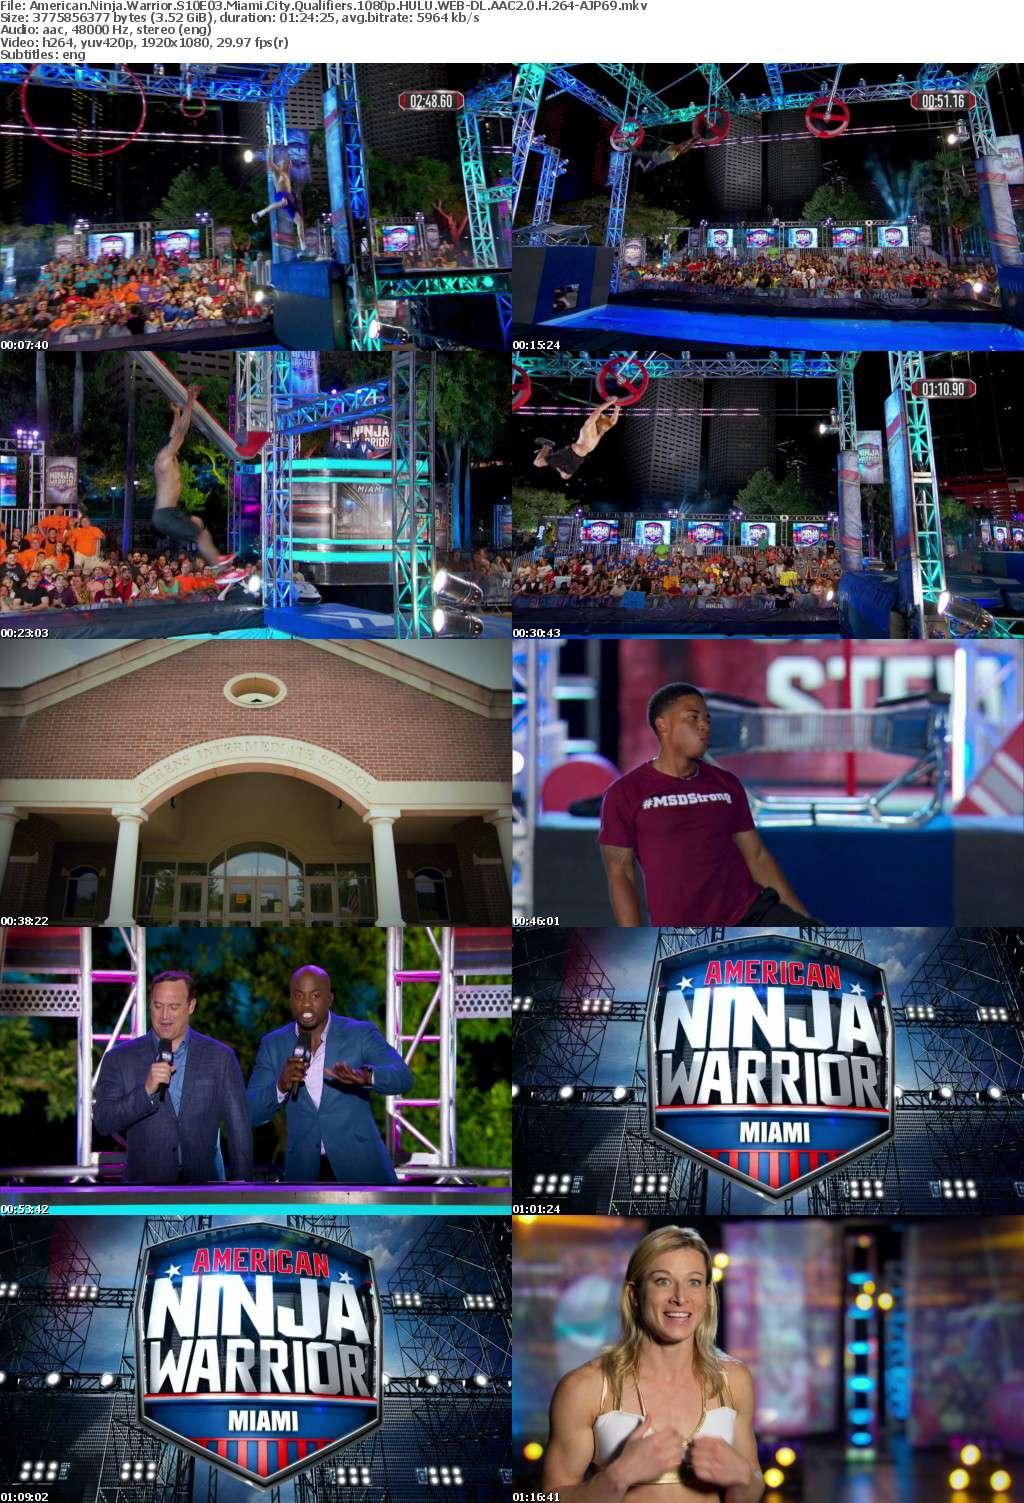 American Ninja Warrior S10E03 Miami City Qualifiers 1080p HULU WEB-DL AAC2 0 H 264-AJP69